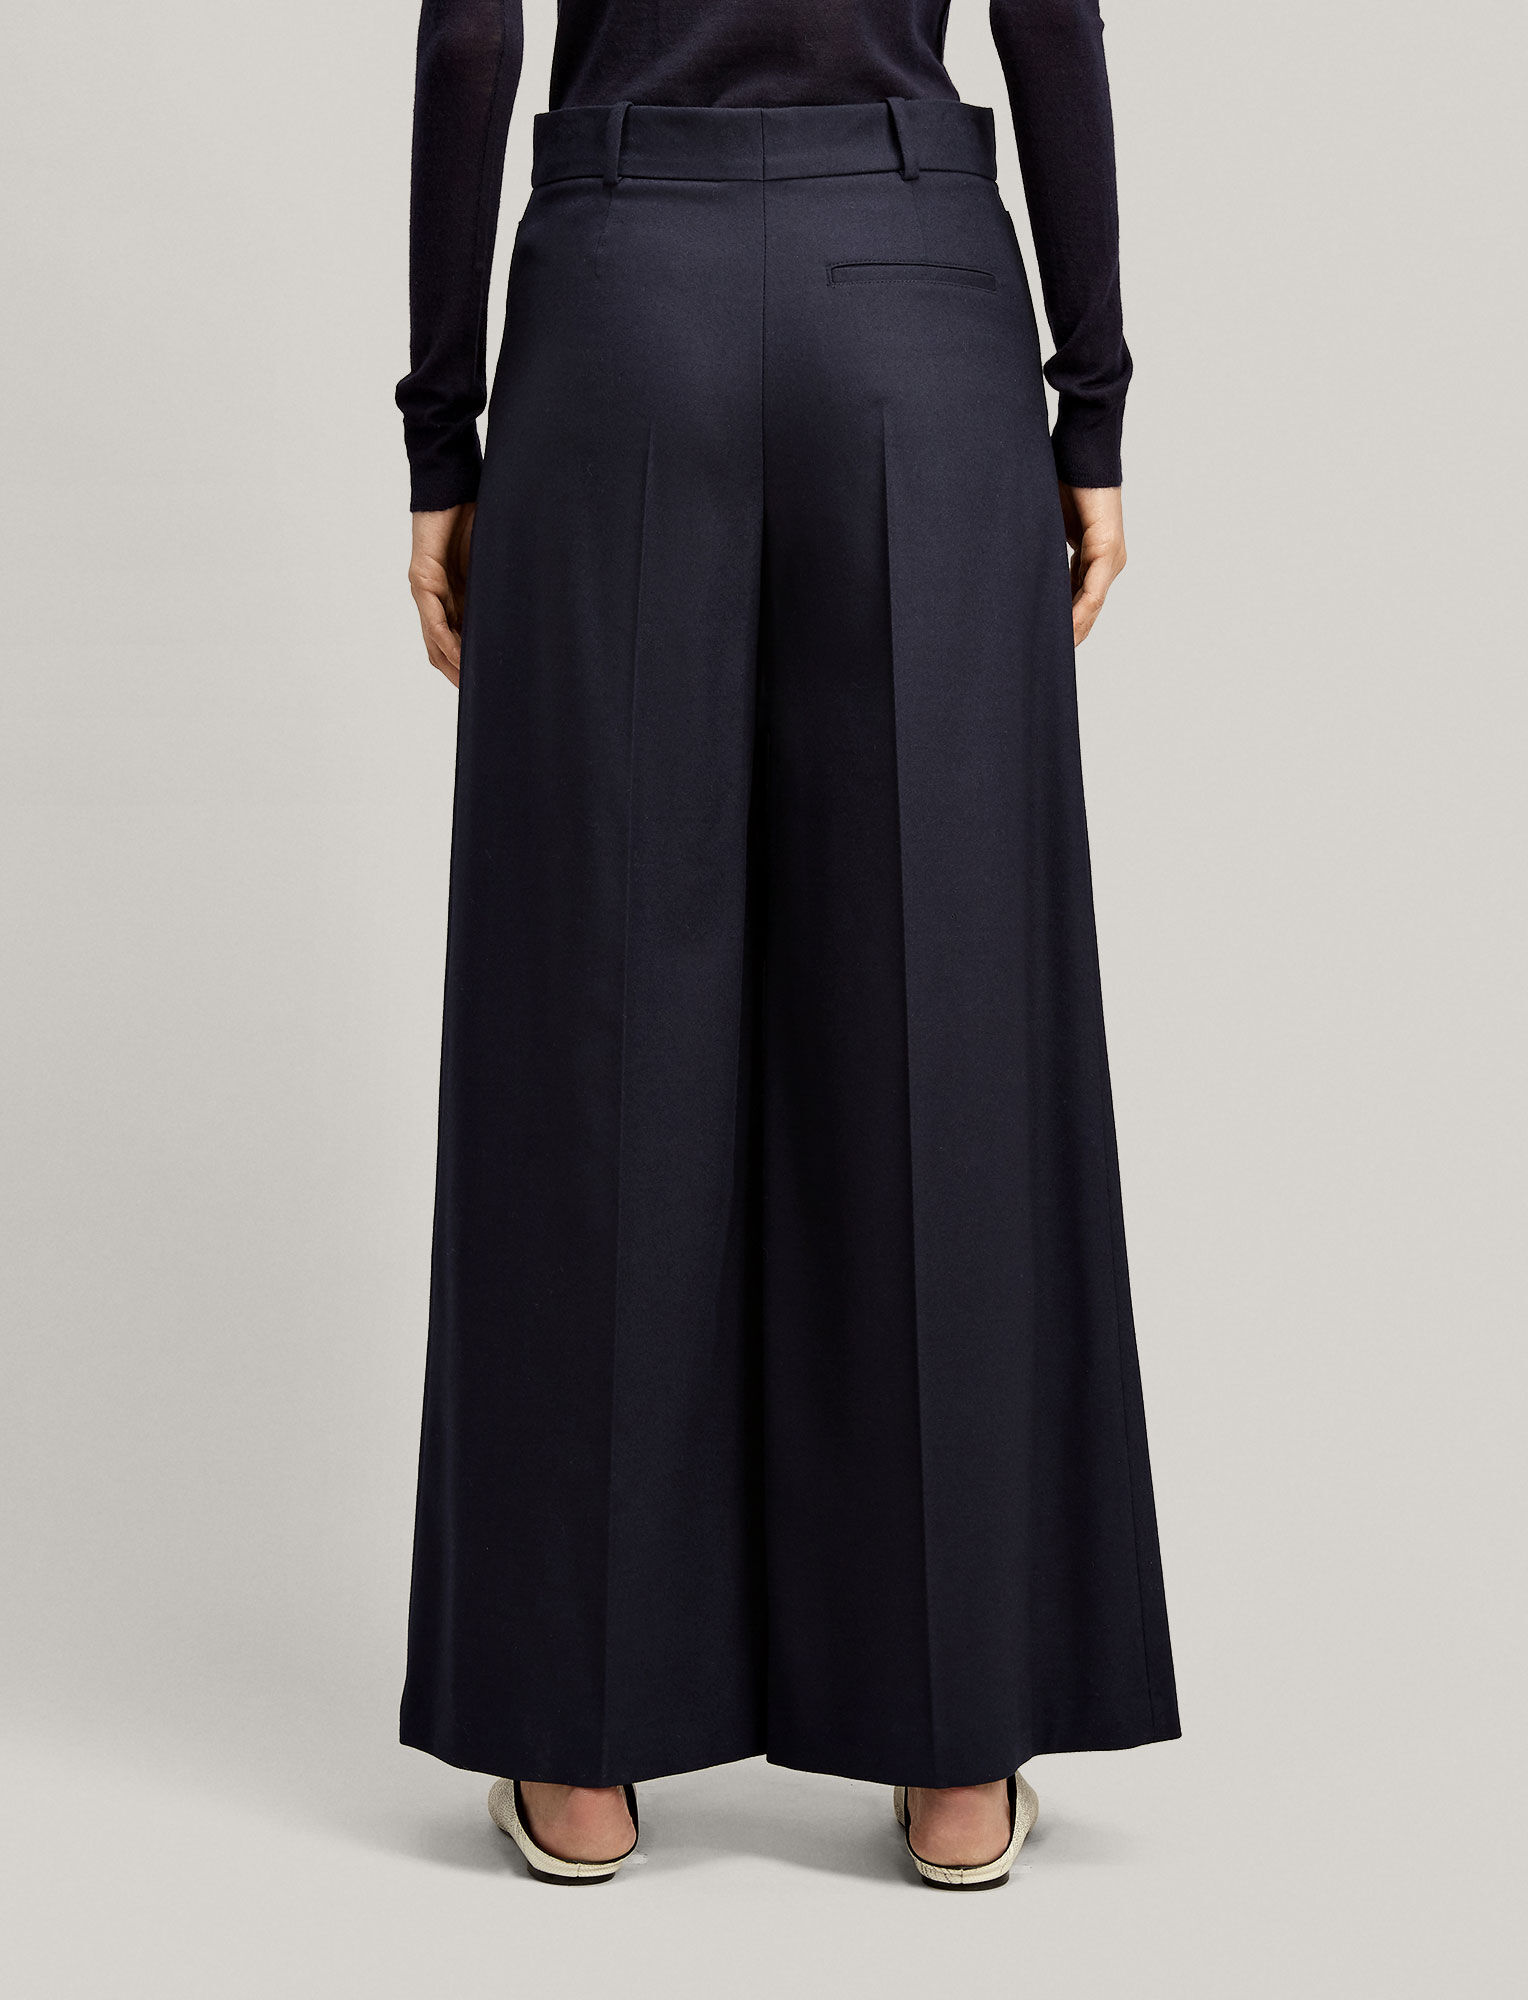 Joseph, Dana Flannel Stretch Trousers, in NAVY